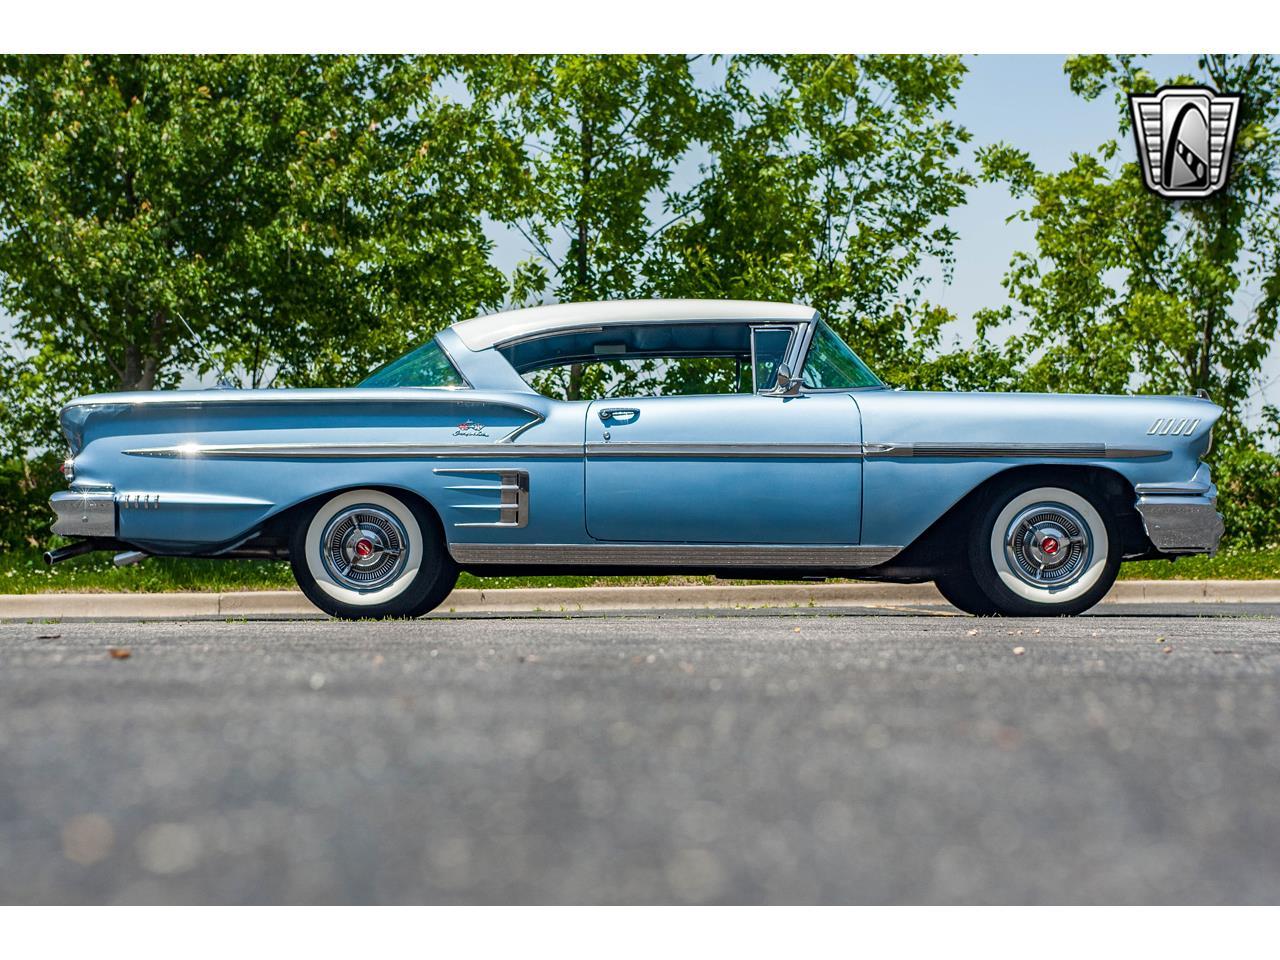 Large Picture of 1958 Chevrolet Impala - $62,000.00 - QB9Q